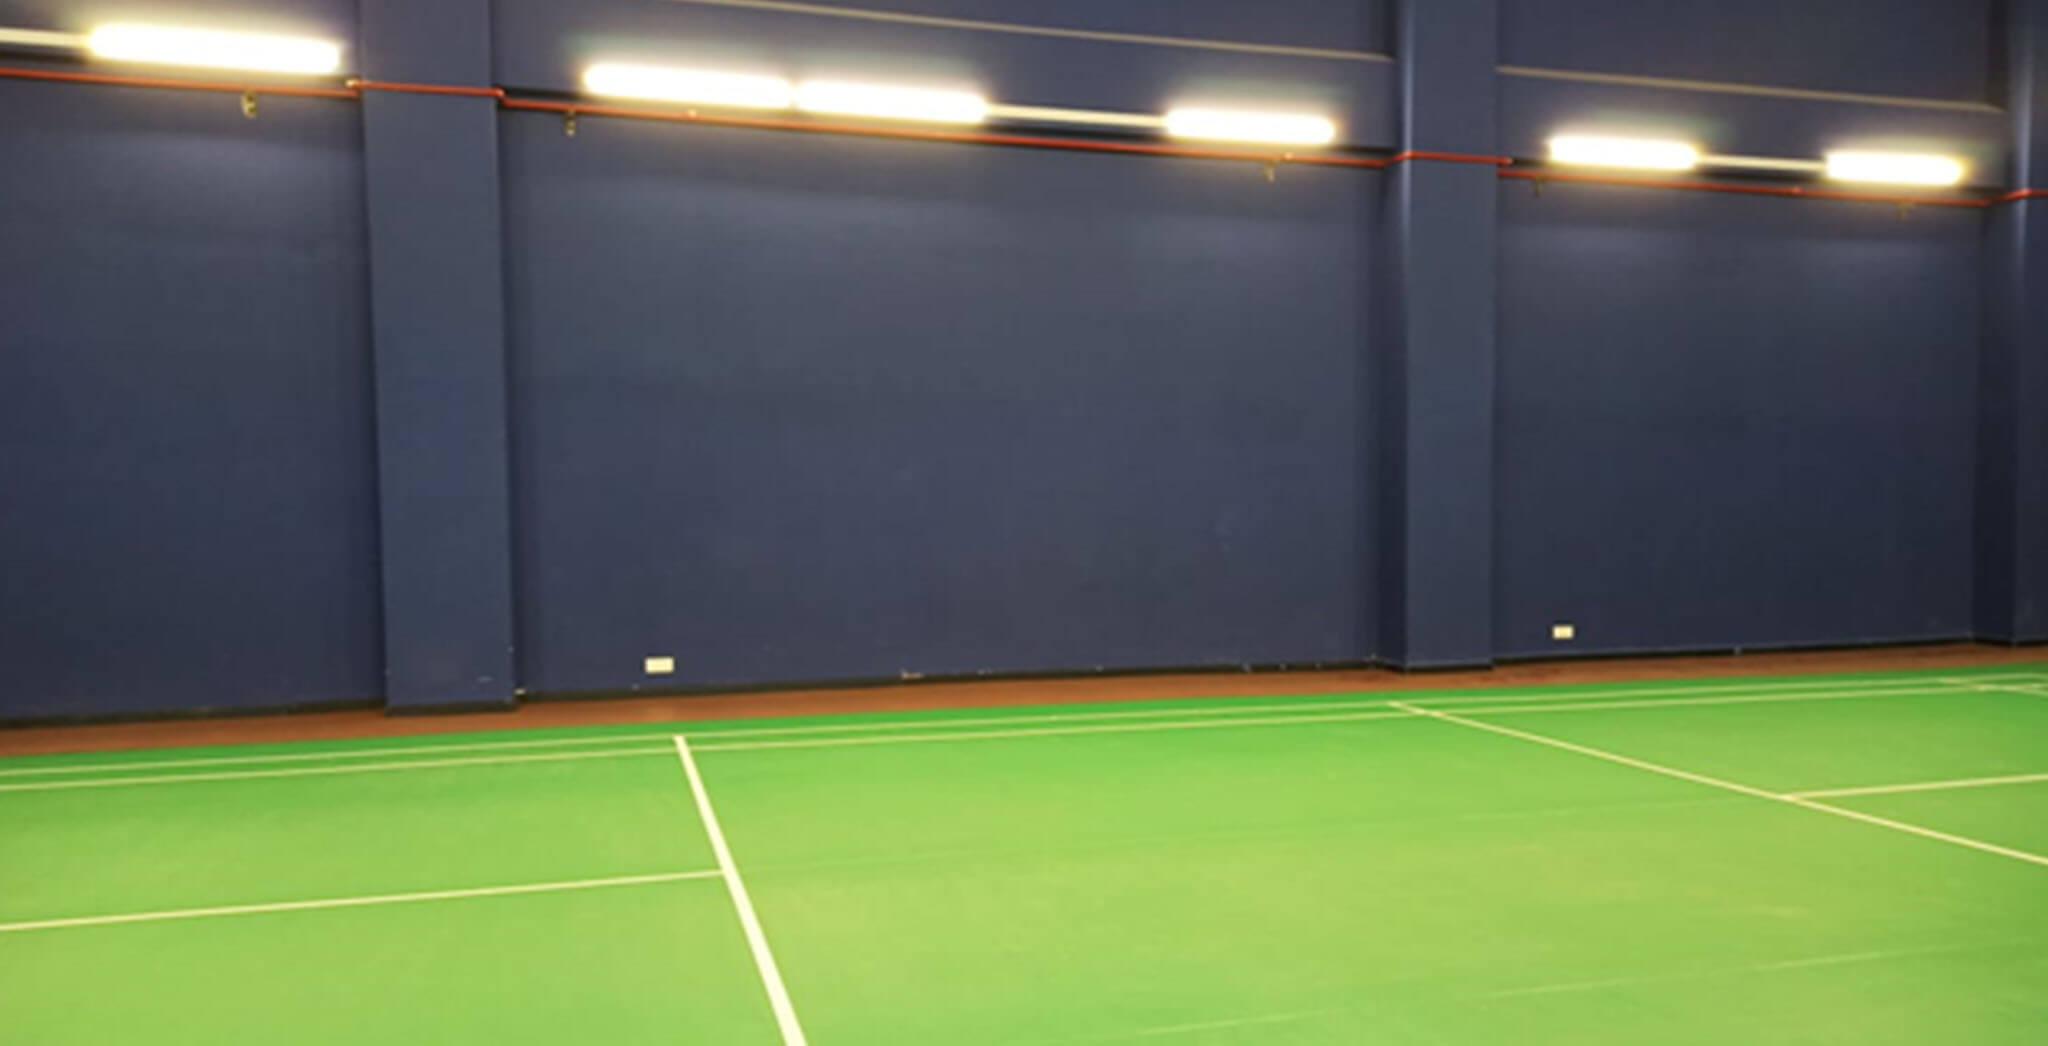 Feb 2020 - Badminton Court